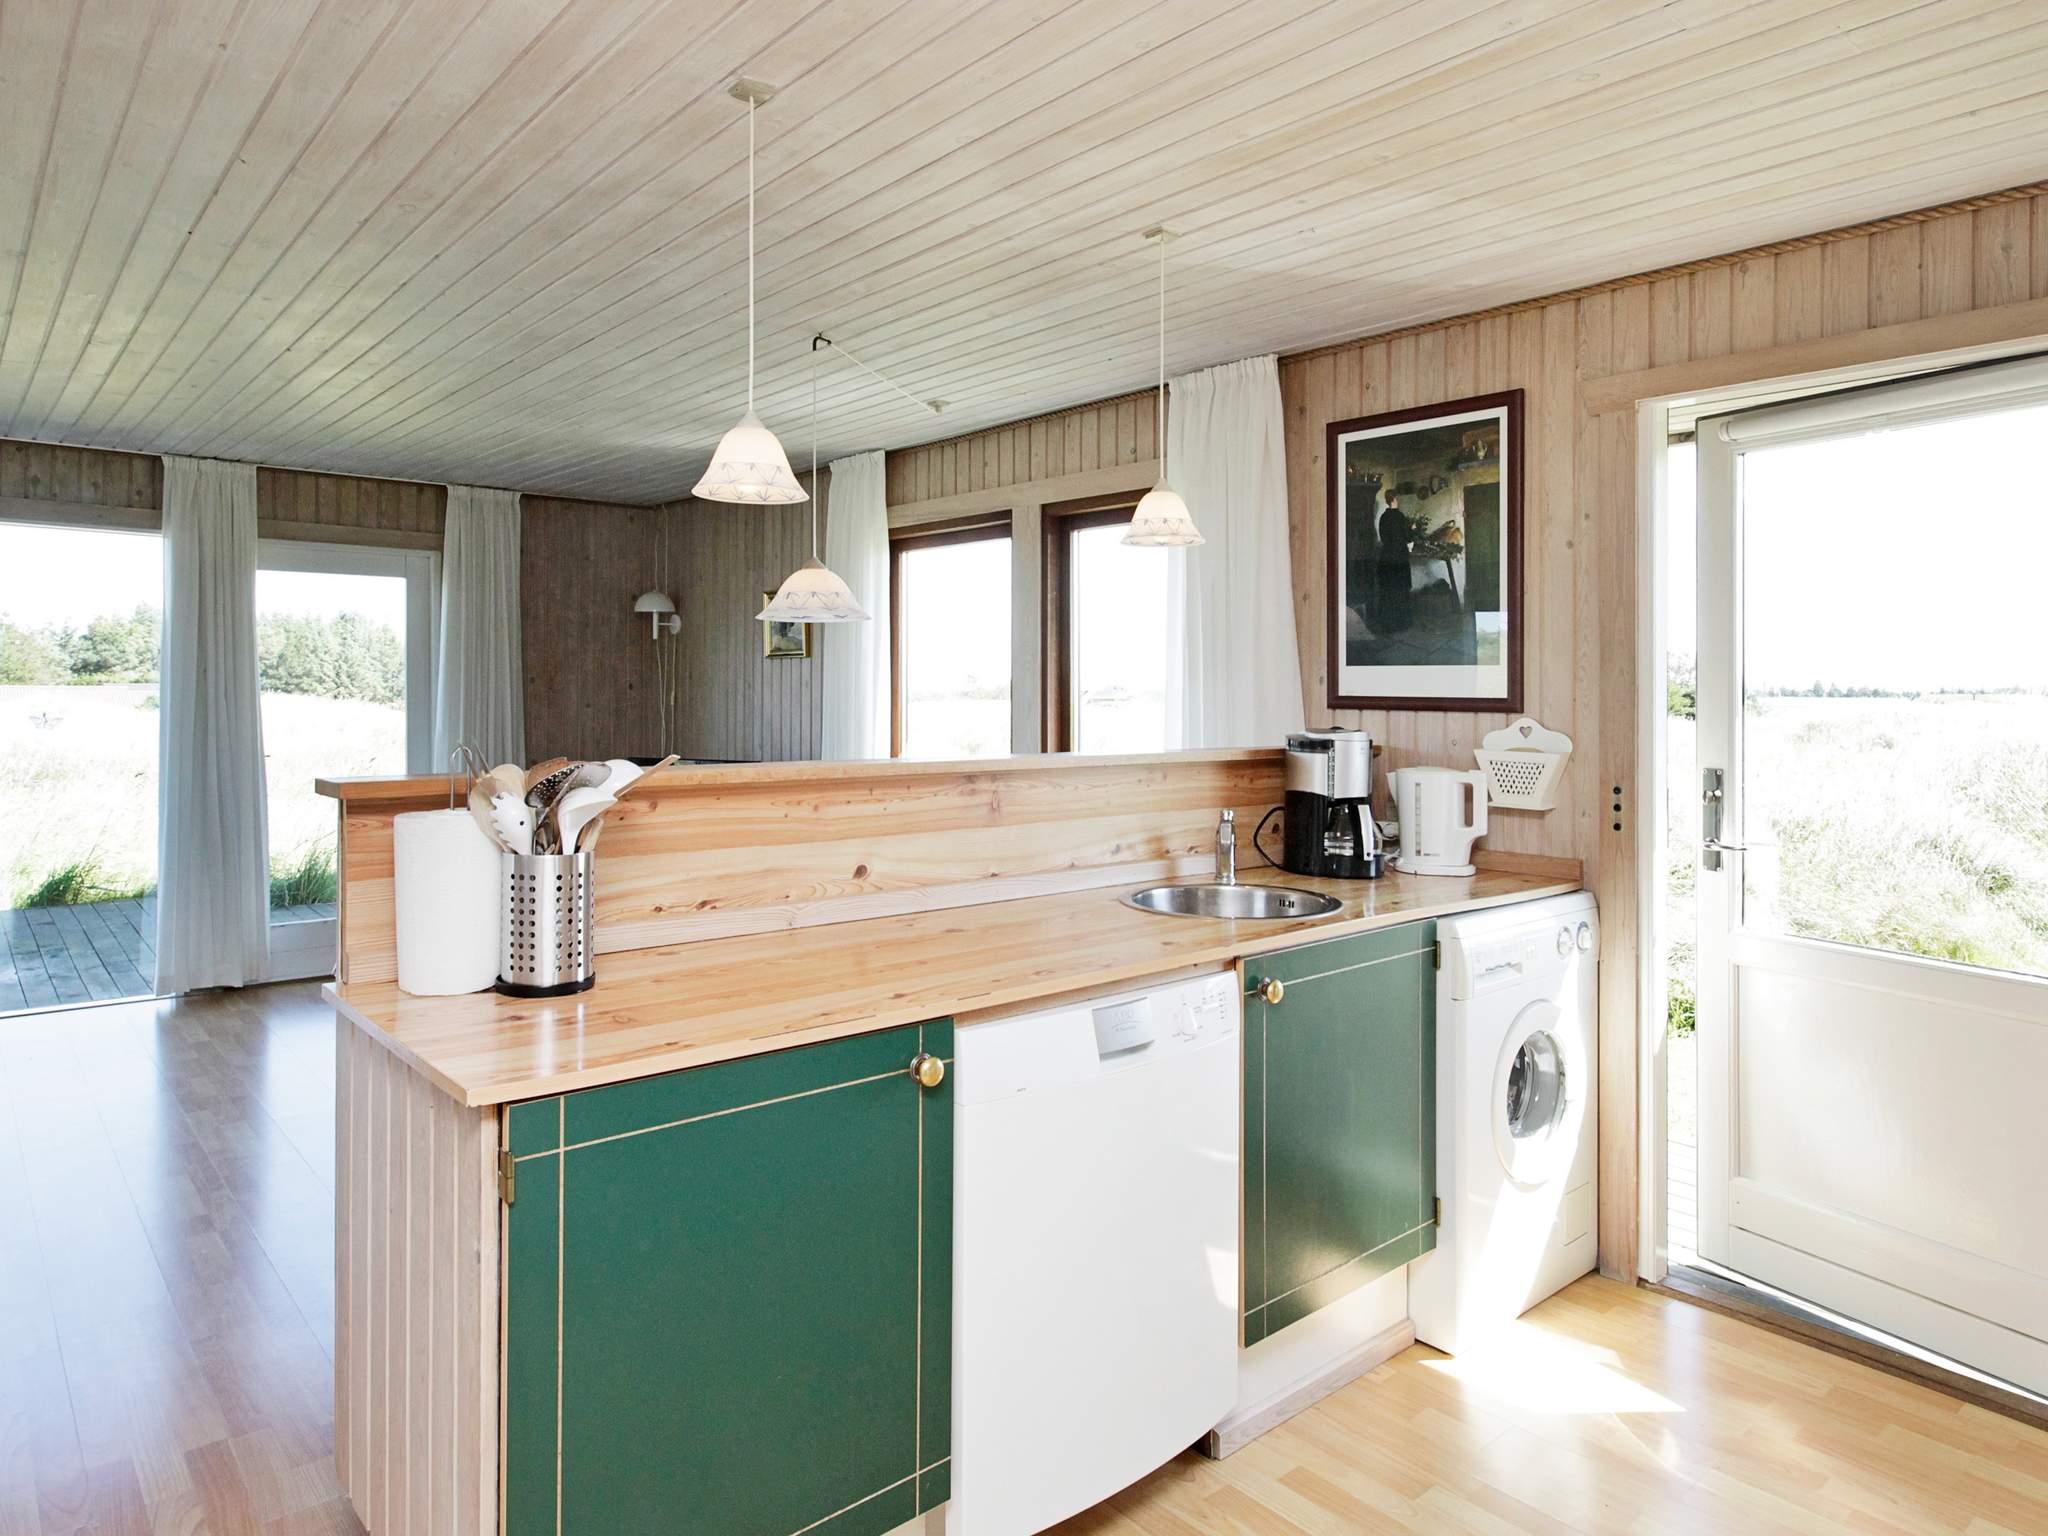 Ferienhaus Grønhøj Strand (83808), Løkken, , Nordwestjütland, Dänemark, Bild 10